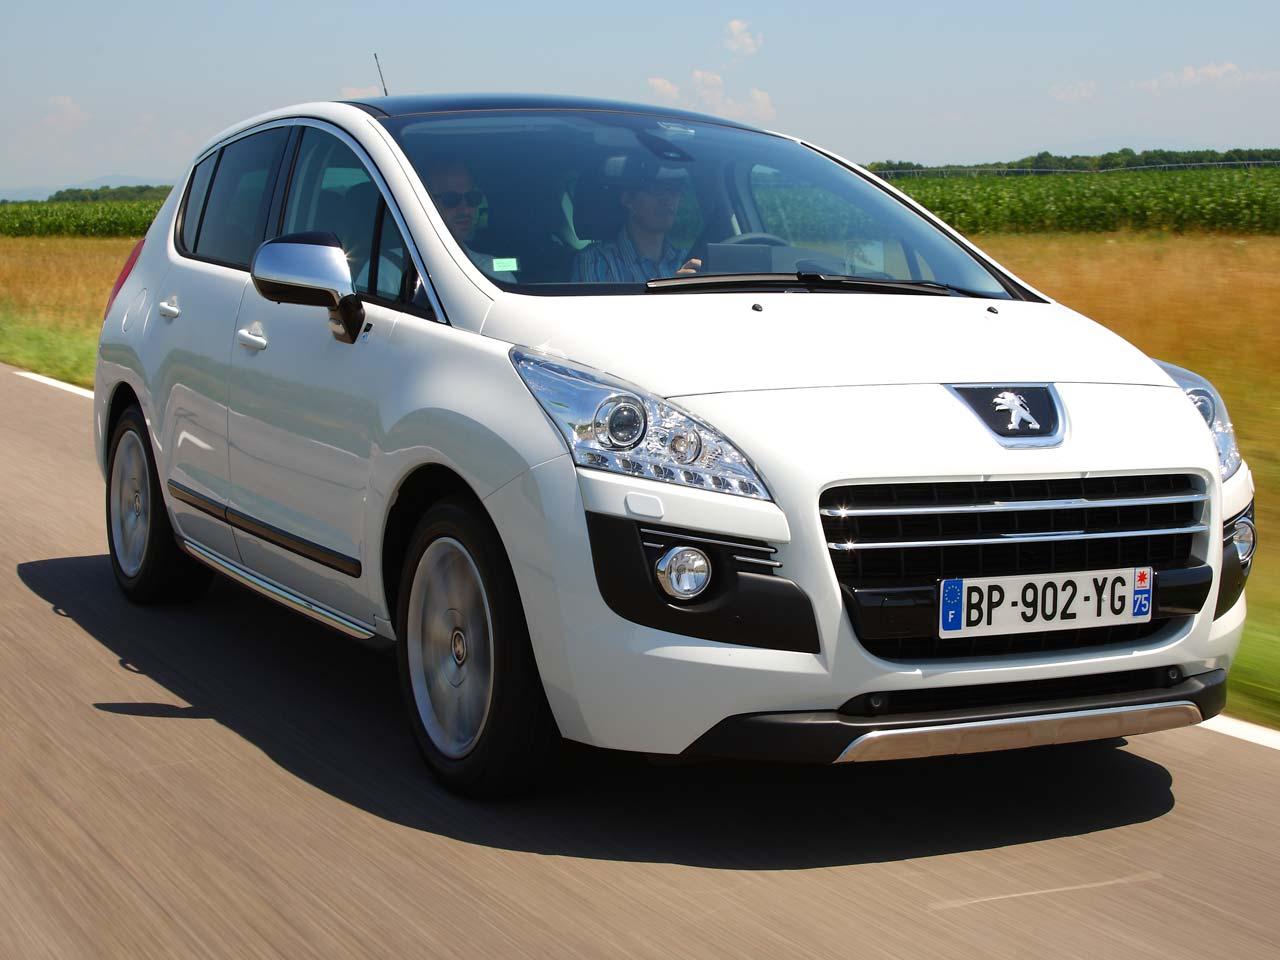 Neuer Peugeot 3008 (1. Generation) ab 2009: Testfahrt